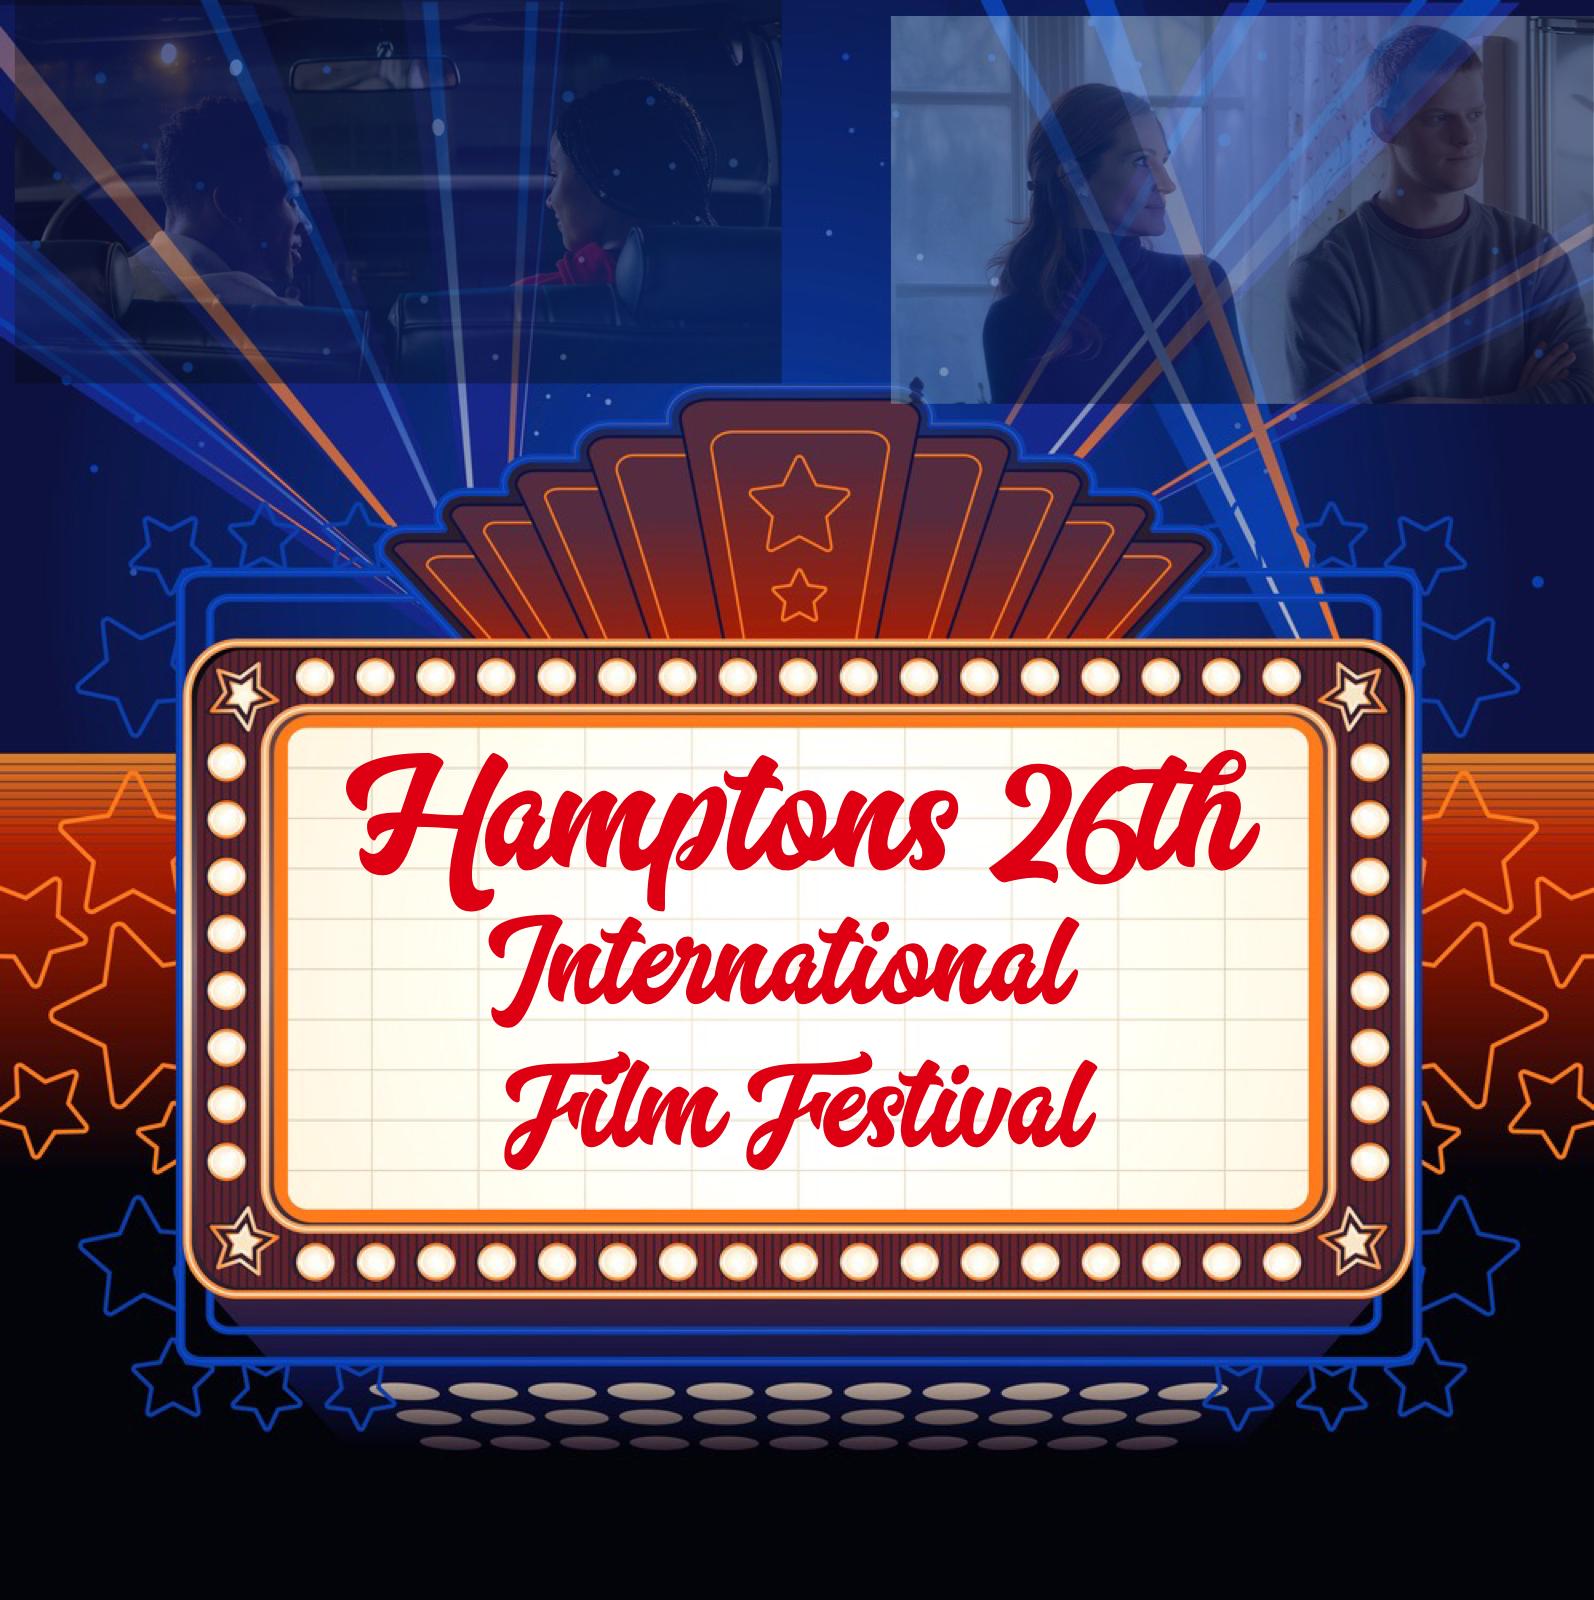 HAMPTONS 26TH ANNUAL INTERNATIONAL FILM FESTIVAL